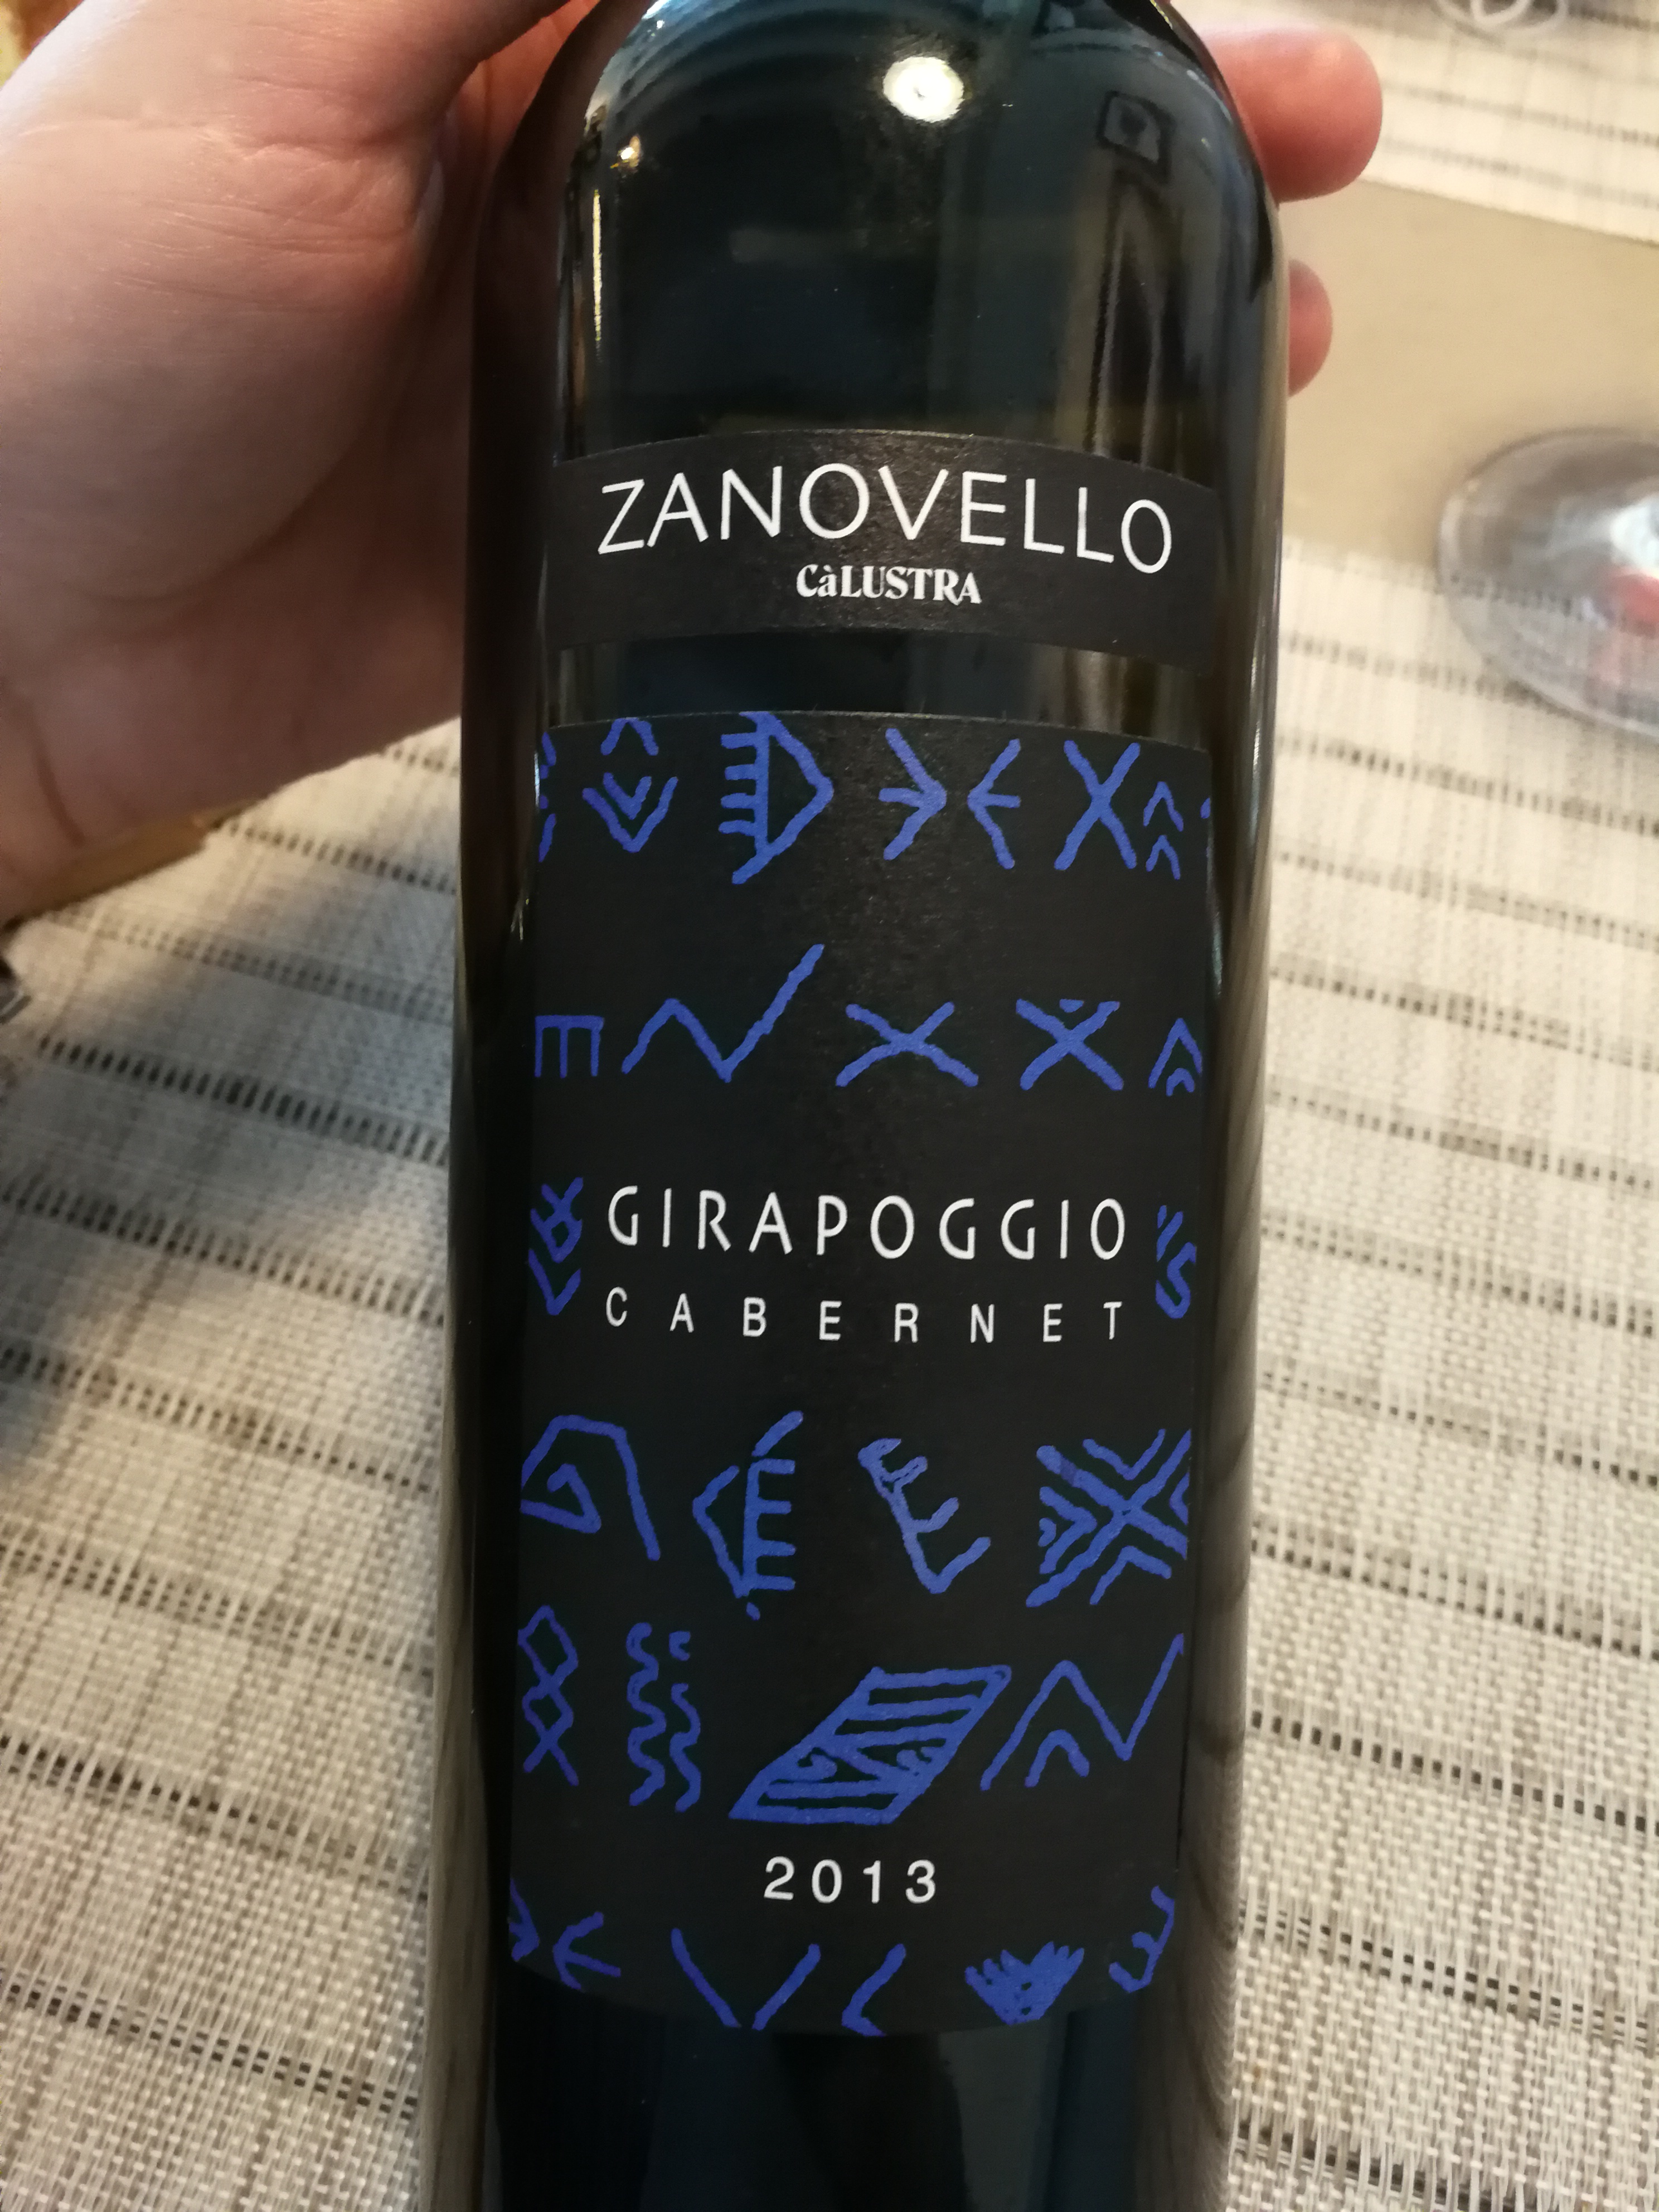 Vino, Carne, Tolin, Macelleria, Lozzo Atestino, Padova, Veneto